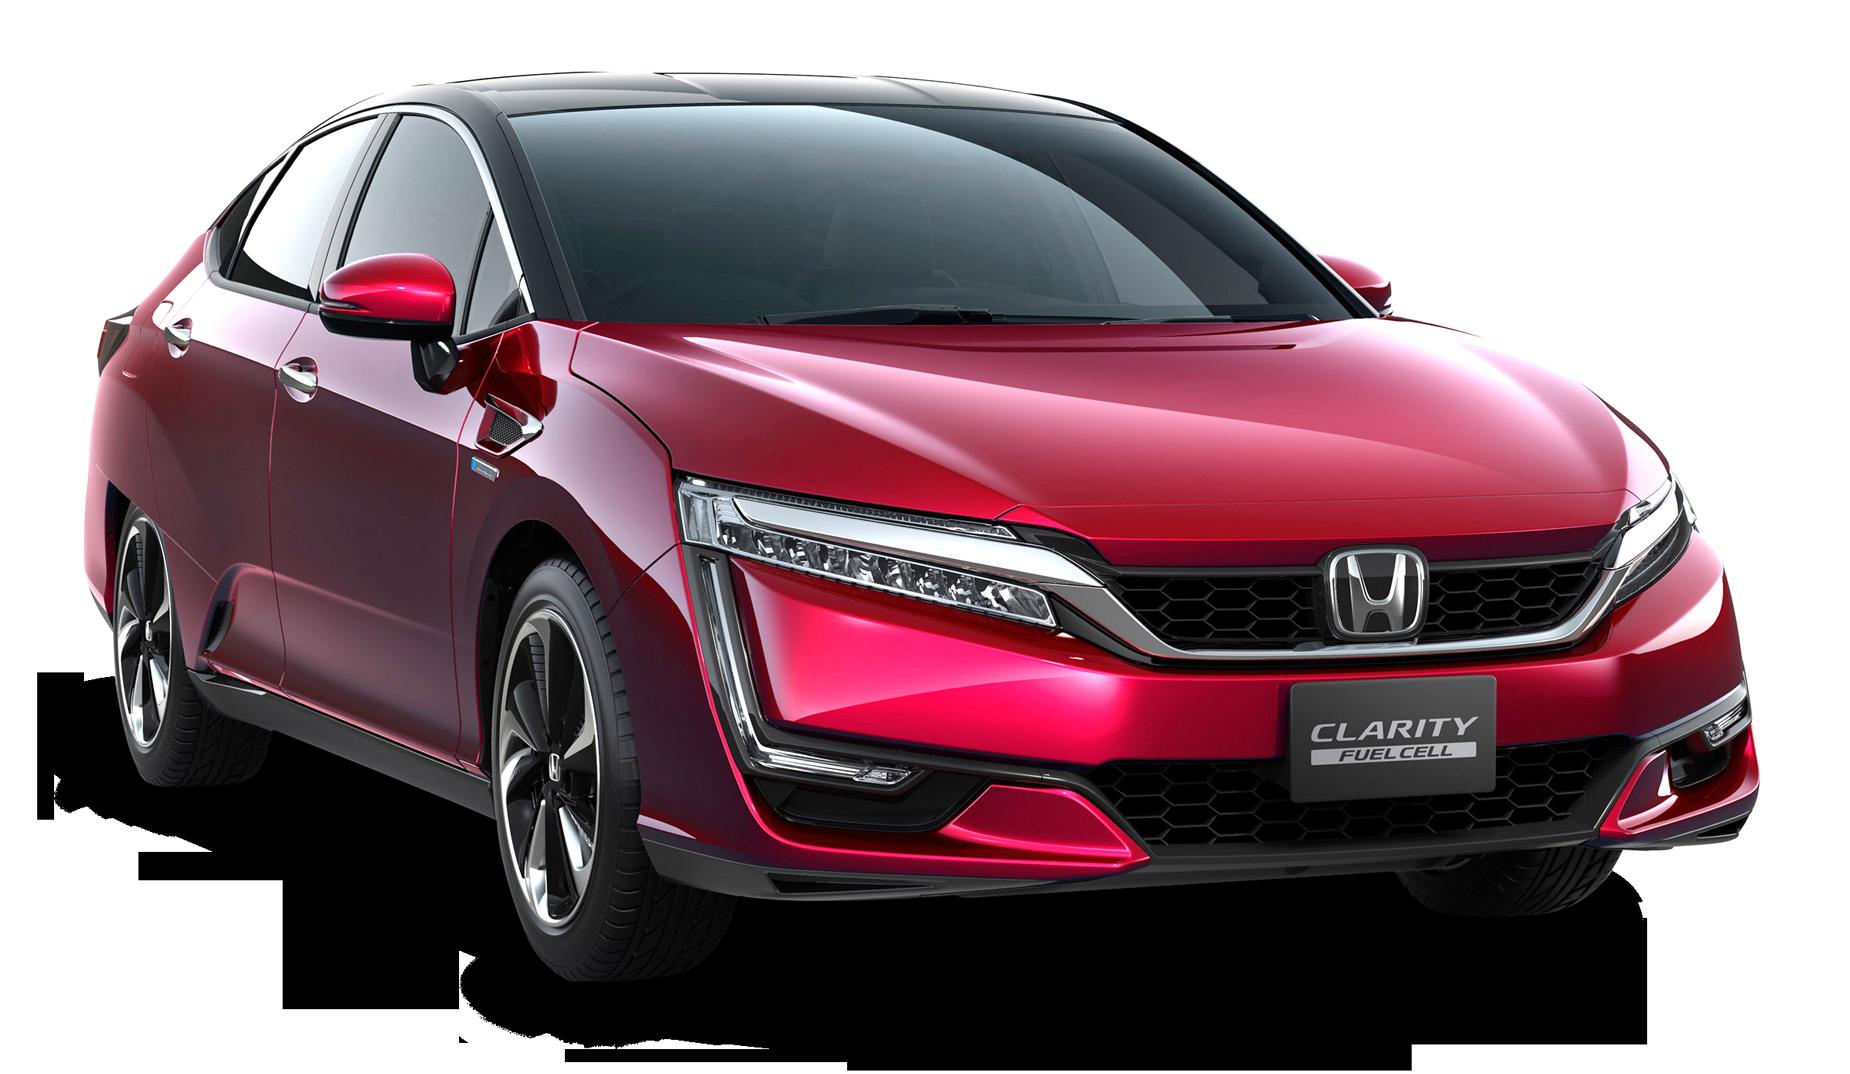 Red Honda Clarity Car Hybrid Car Fuel Cell Cars Honda Cars